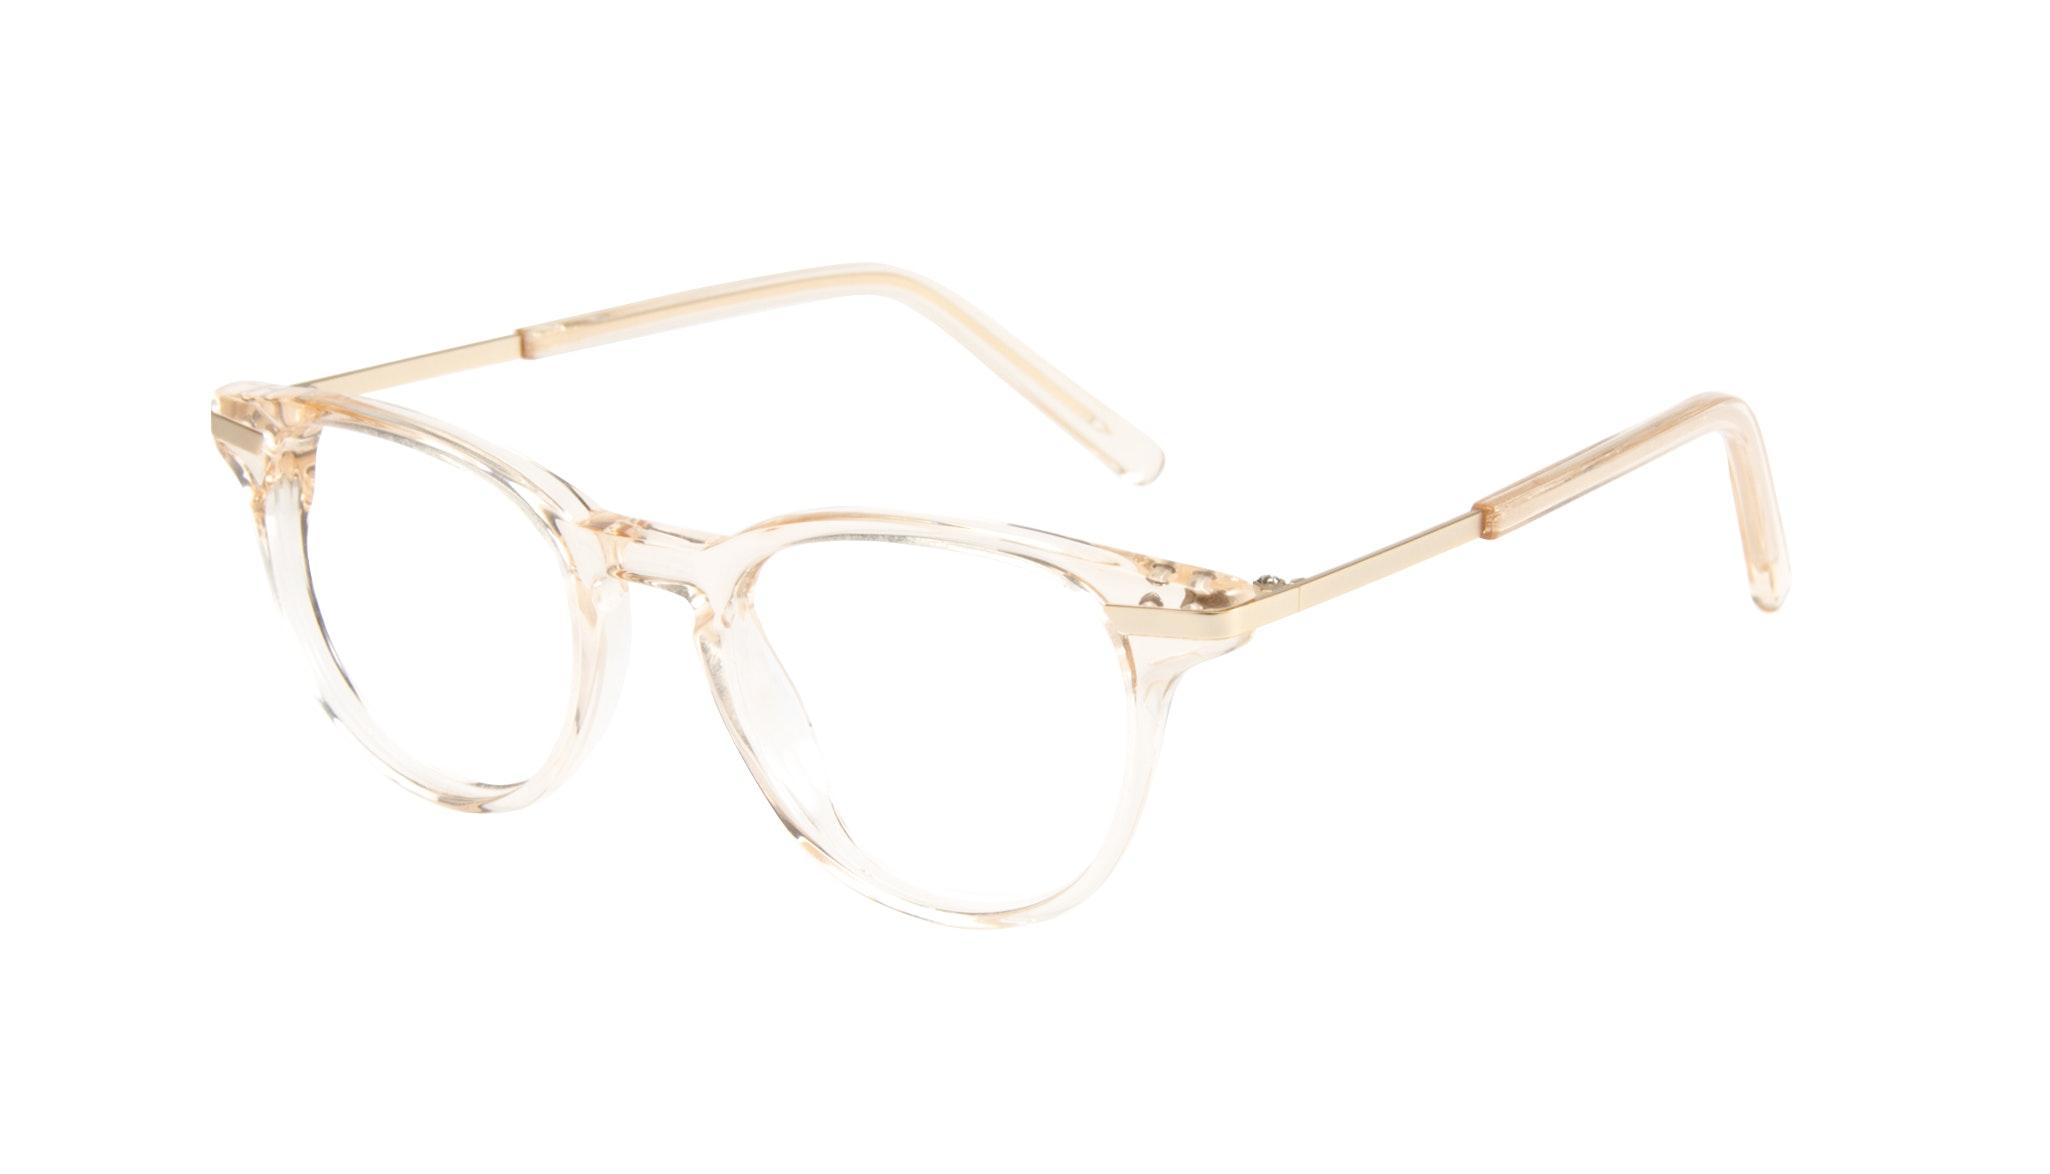 Affordable Fashion Glasses Round Eyeglasses Women Spark Blond Tilt